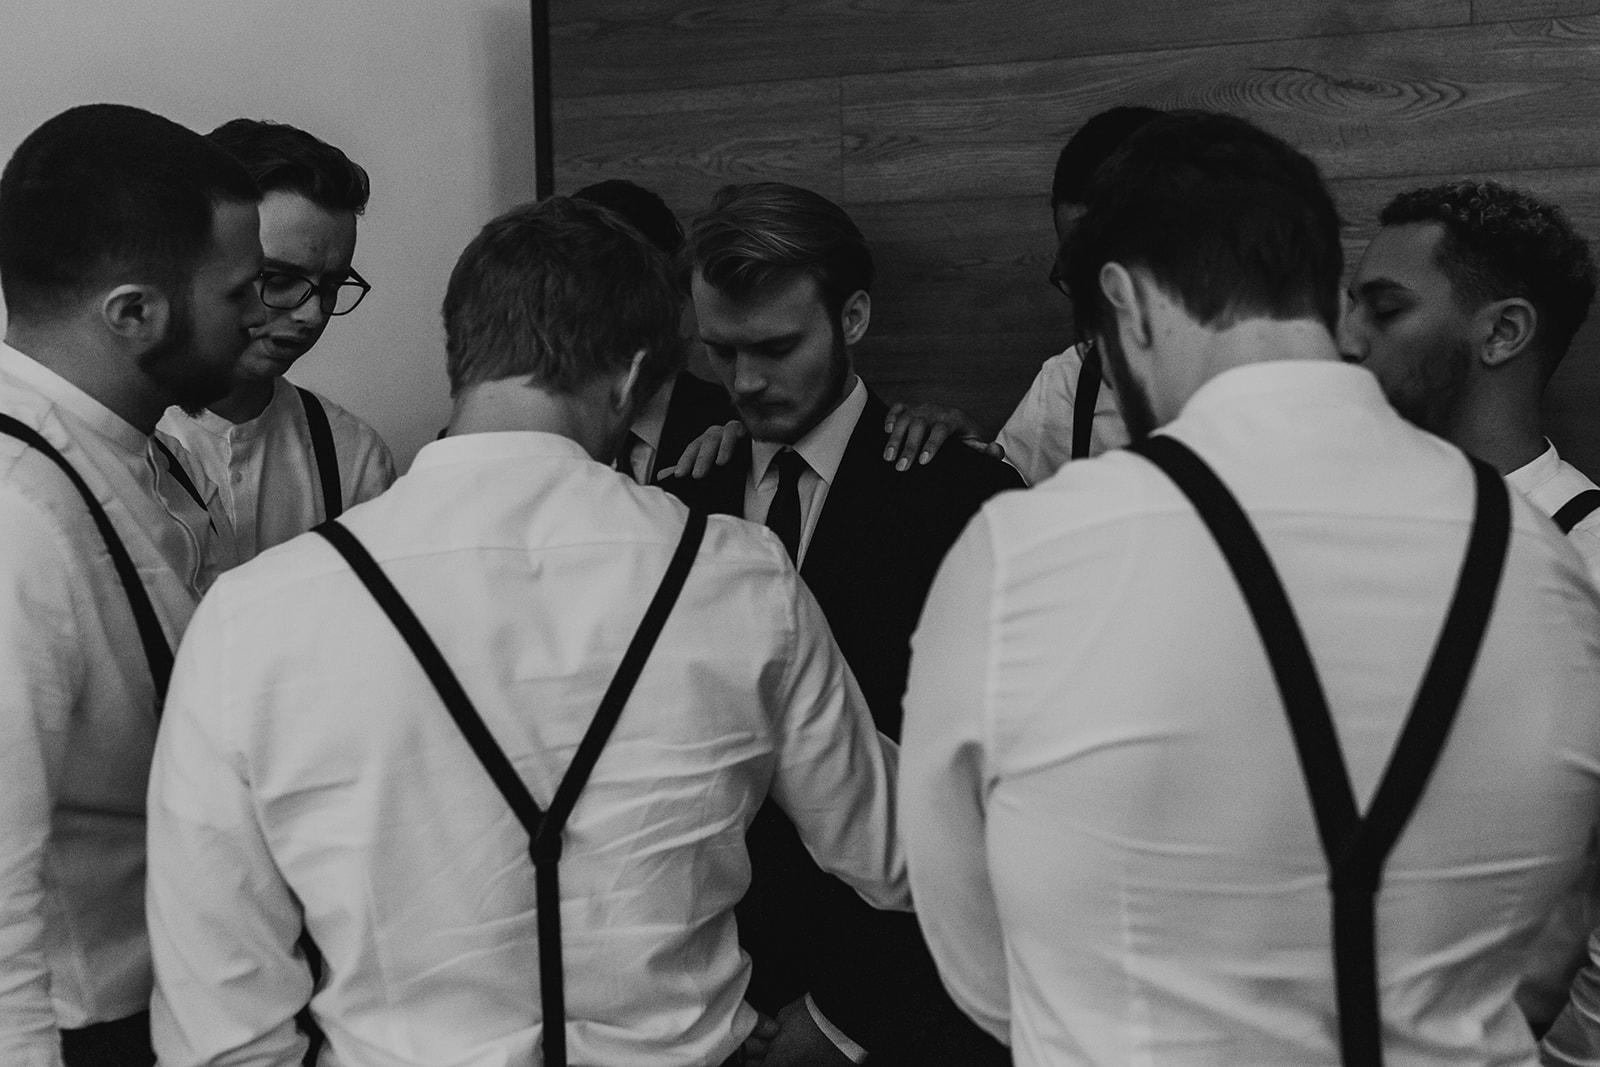 Black and White Wedding Photography